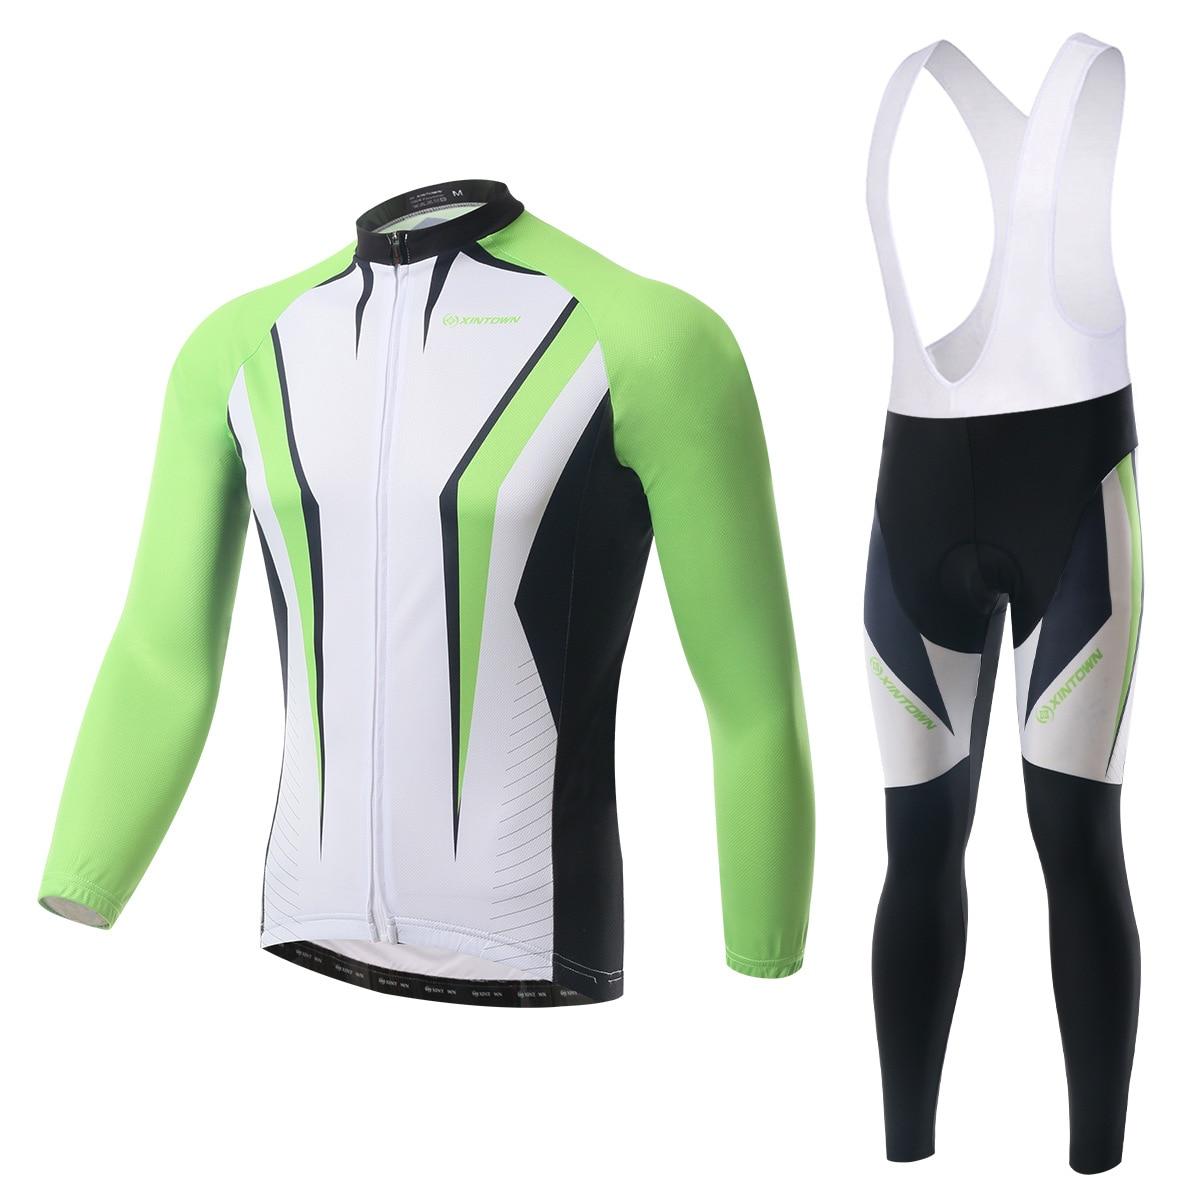 XINTOWN Rui Jian green bike riding jersey strap long-sleeved suit wear bicycle suits fleece wind warm features underwear